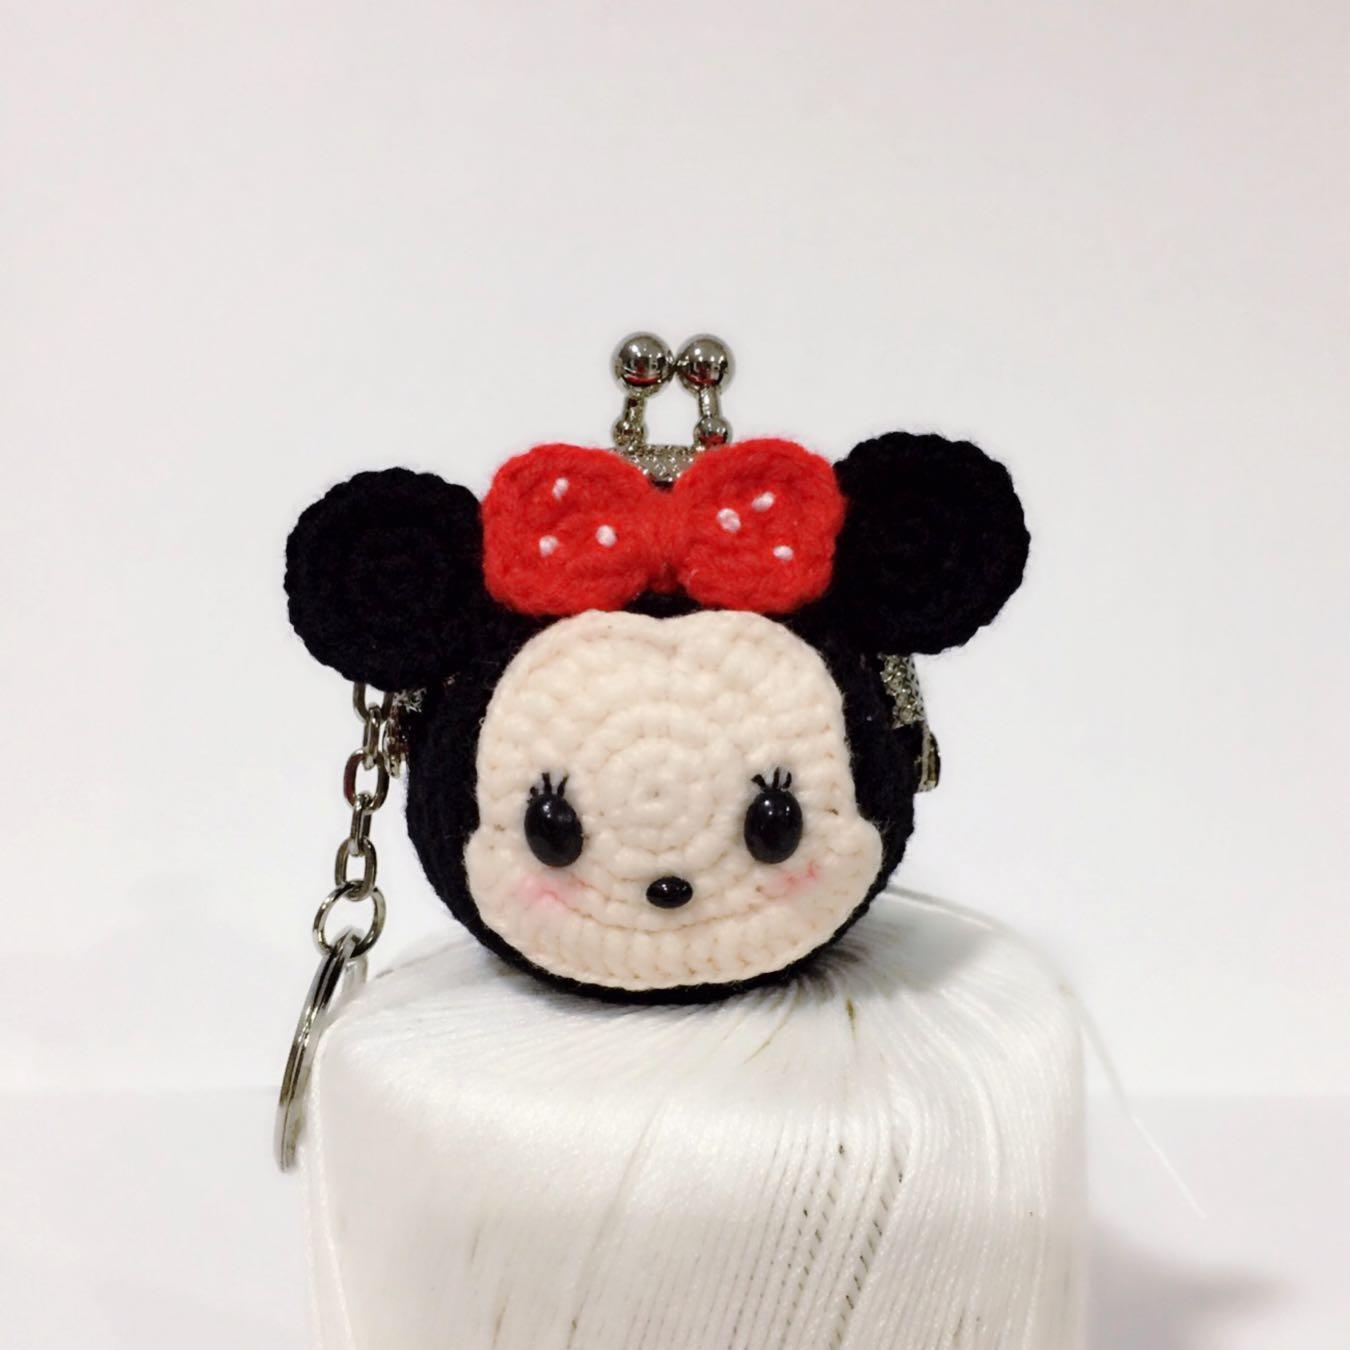 35f5c1539 Handmade Crochet Amigurumi Minnie Mouse Mini Coin Purse Keychain ...